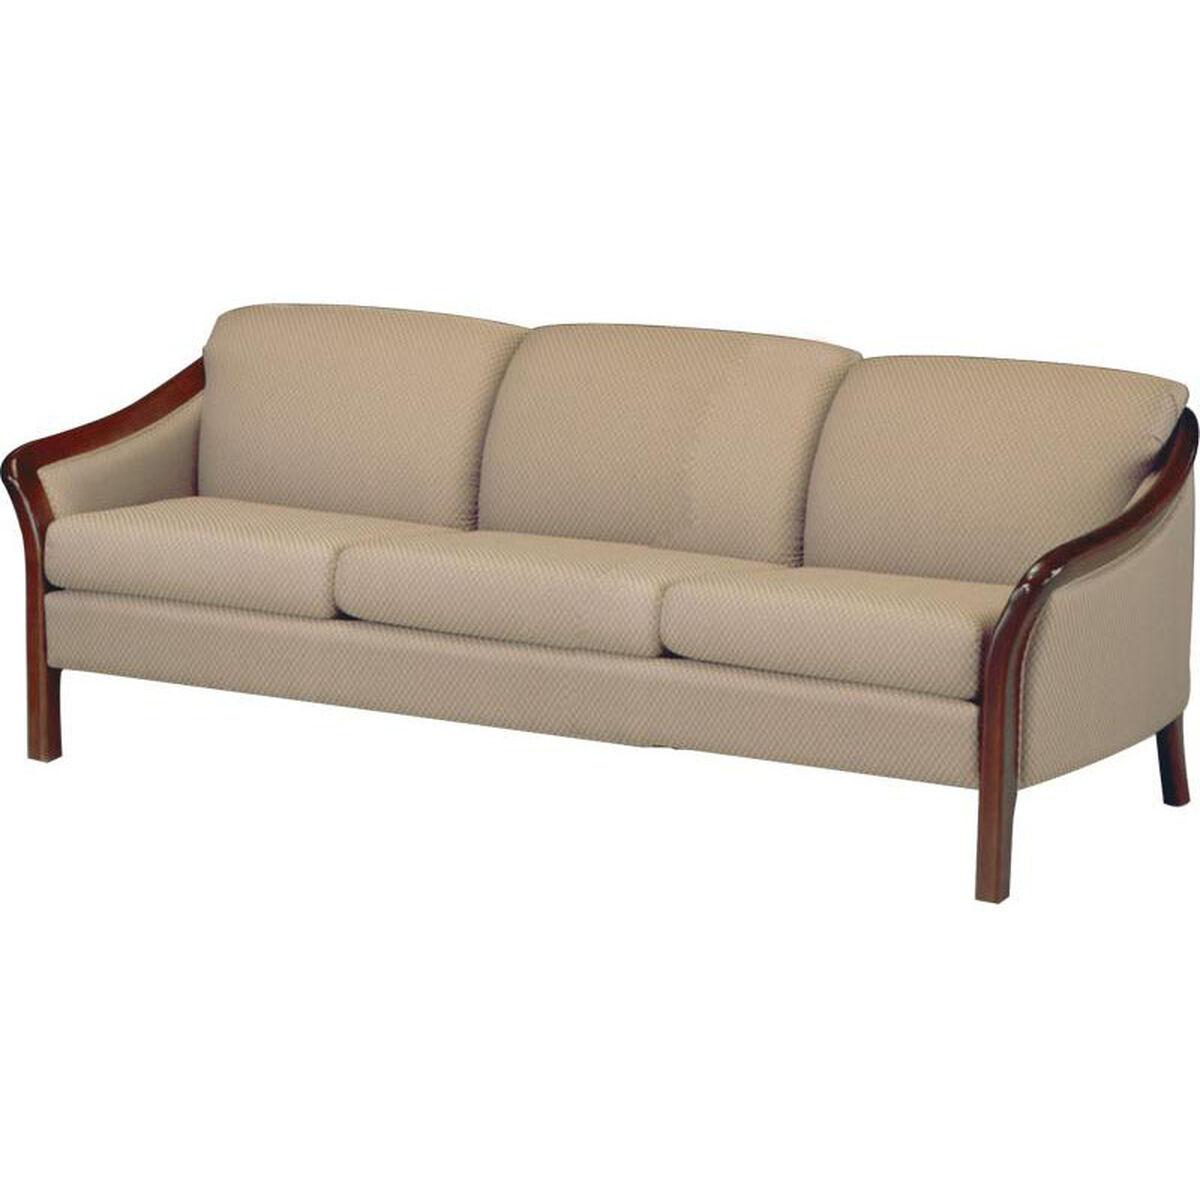 High Point Furniture Industries Quick Ship 9100 Series Sofa 9133